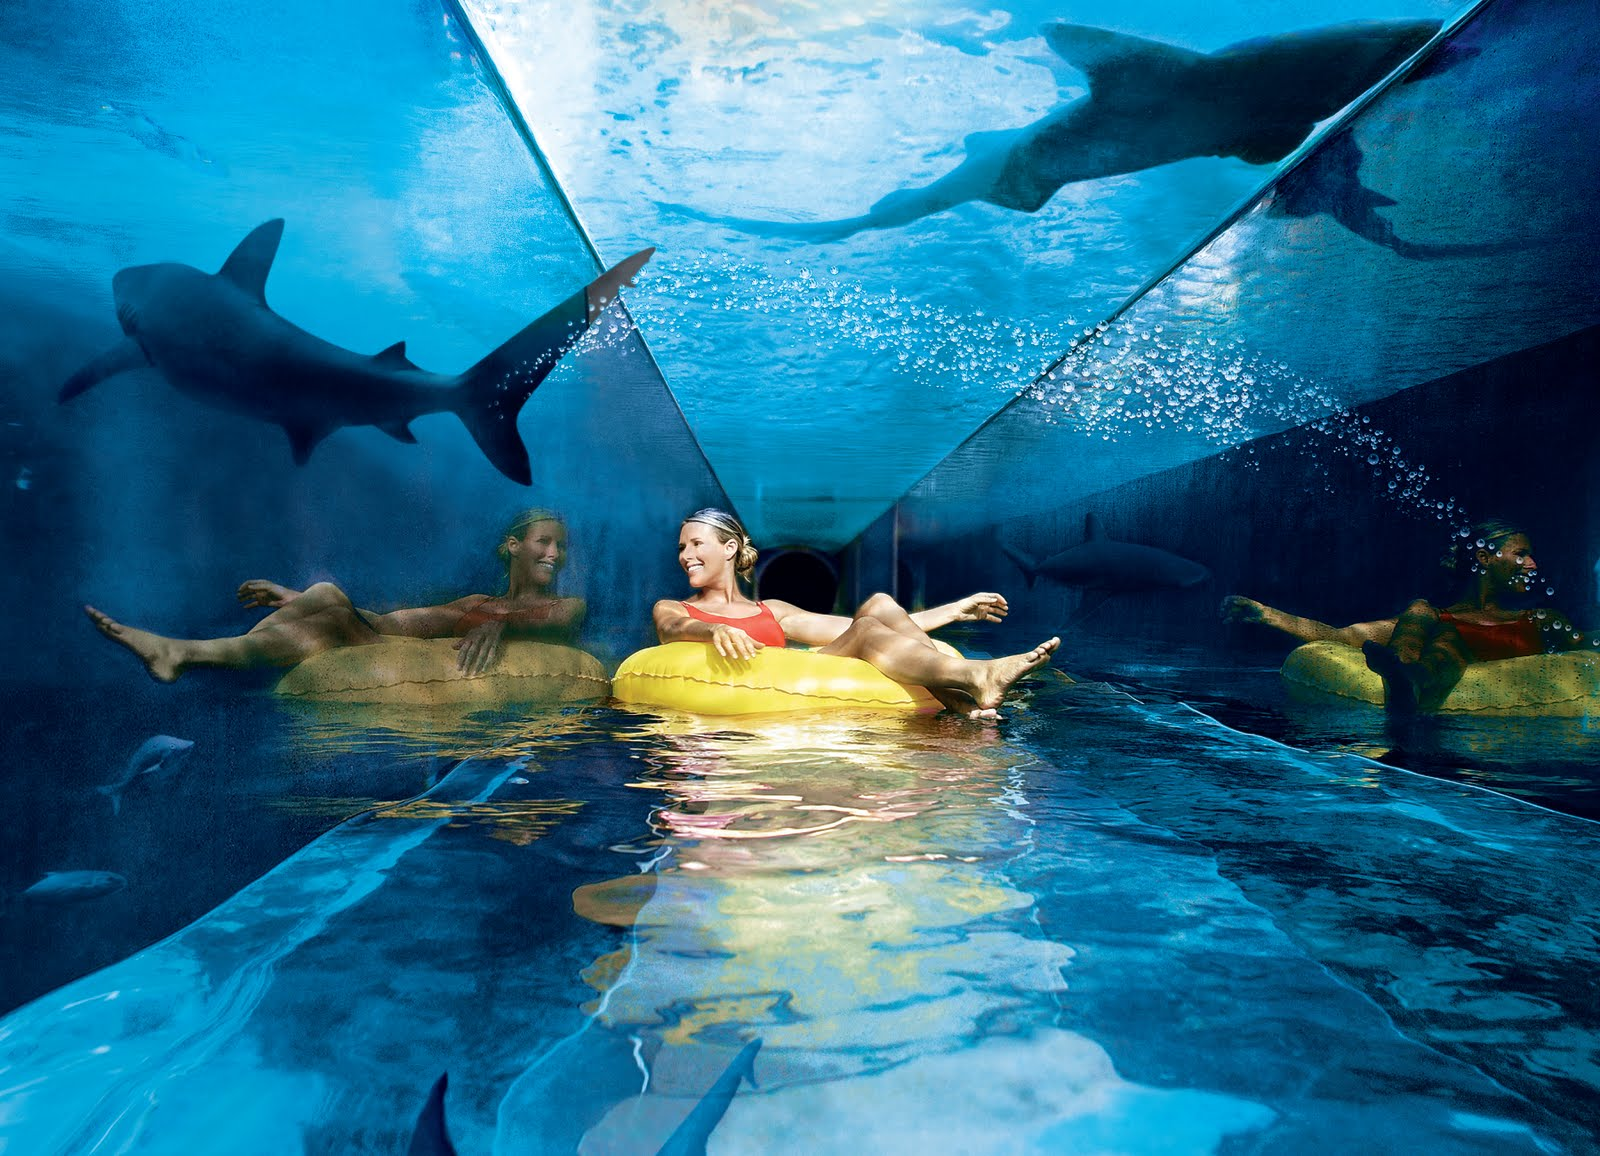 Underwater slide Serpent Slide, Bahamas best water park in the world 2